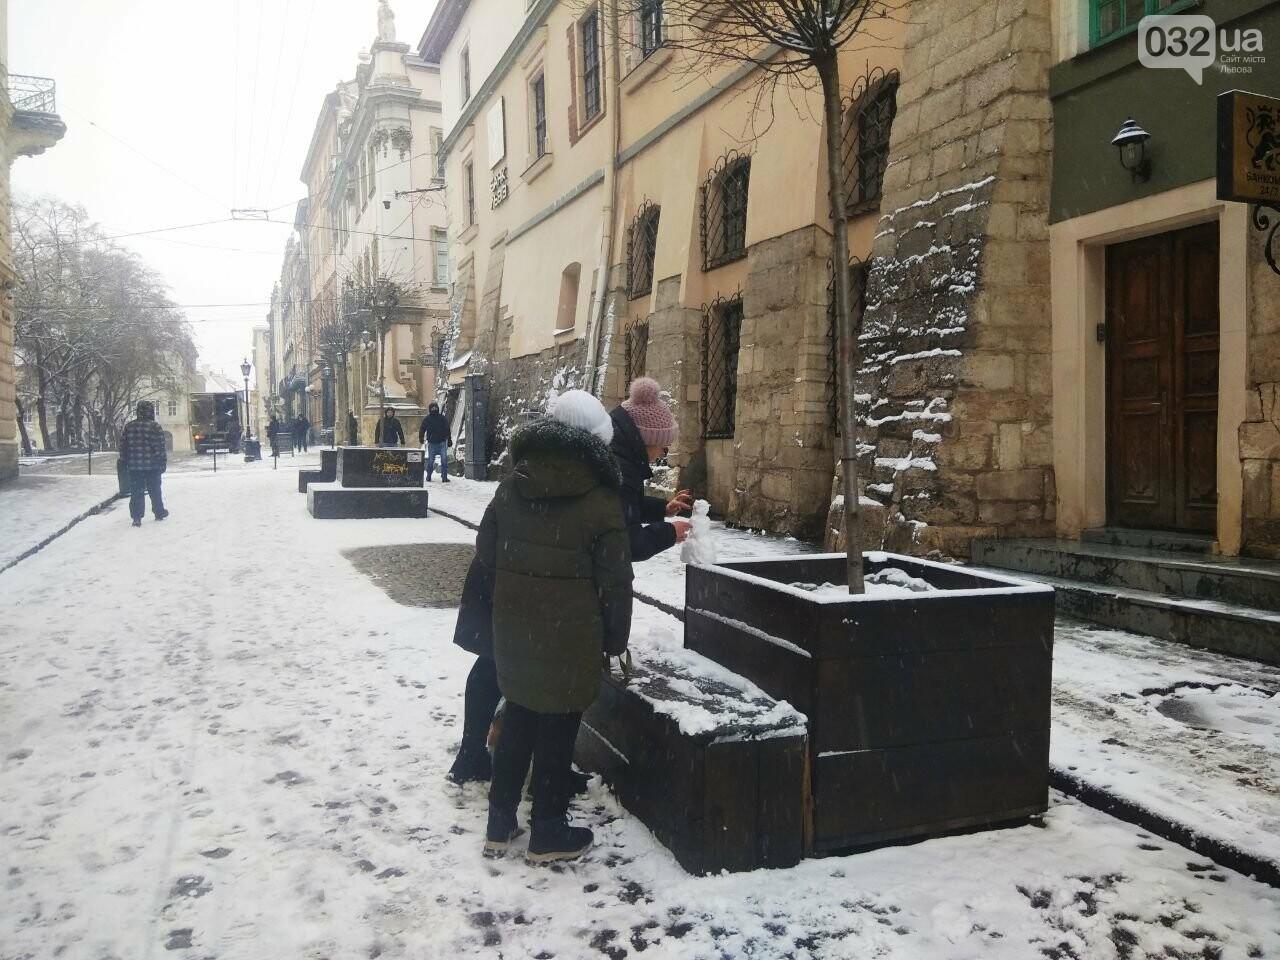 Центр Львова, Фото: 032.ua